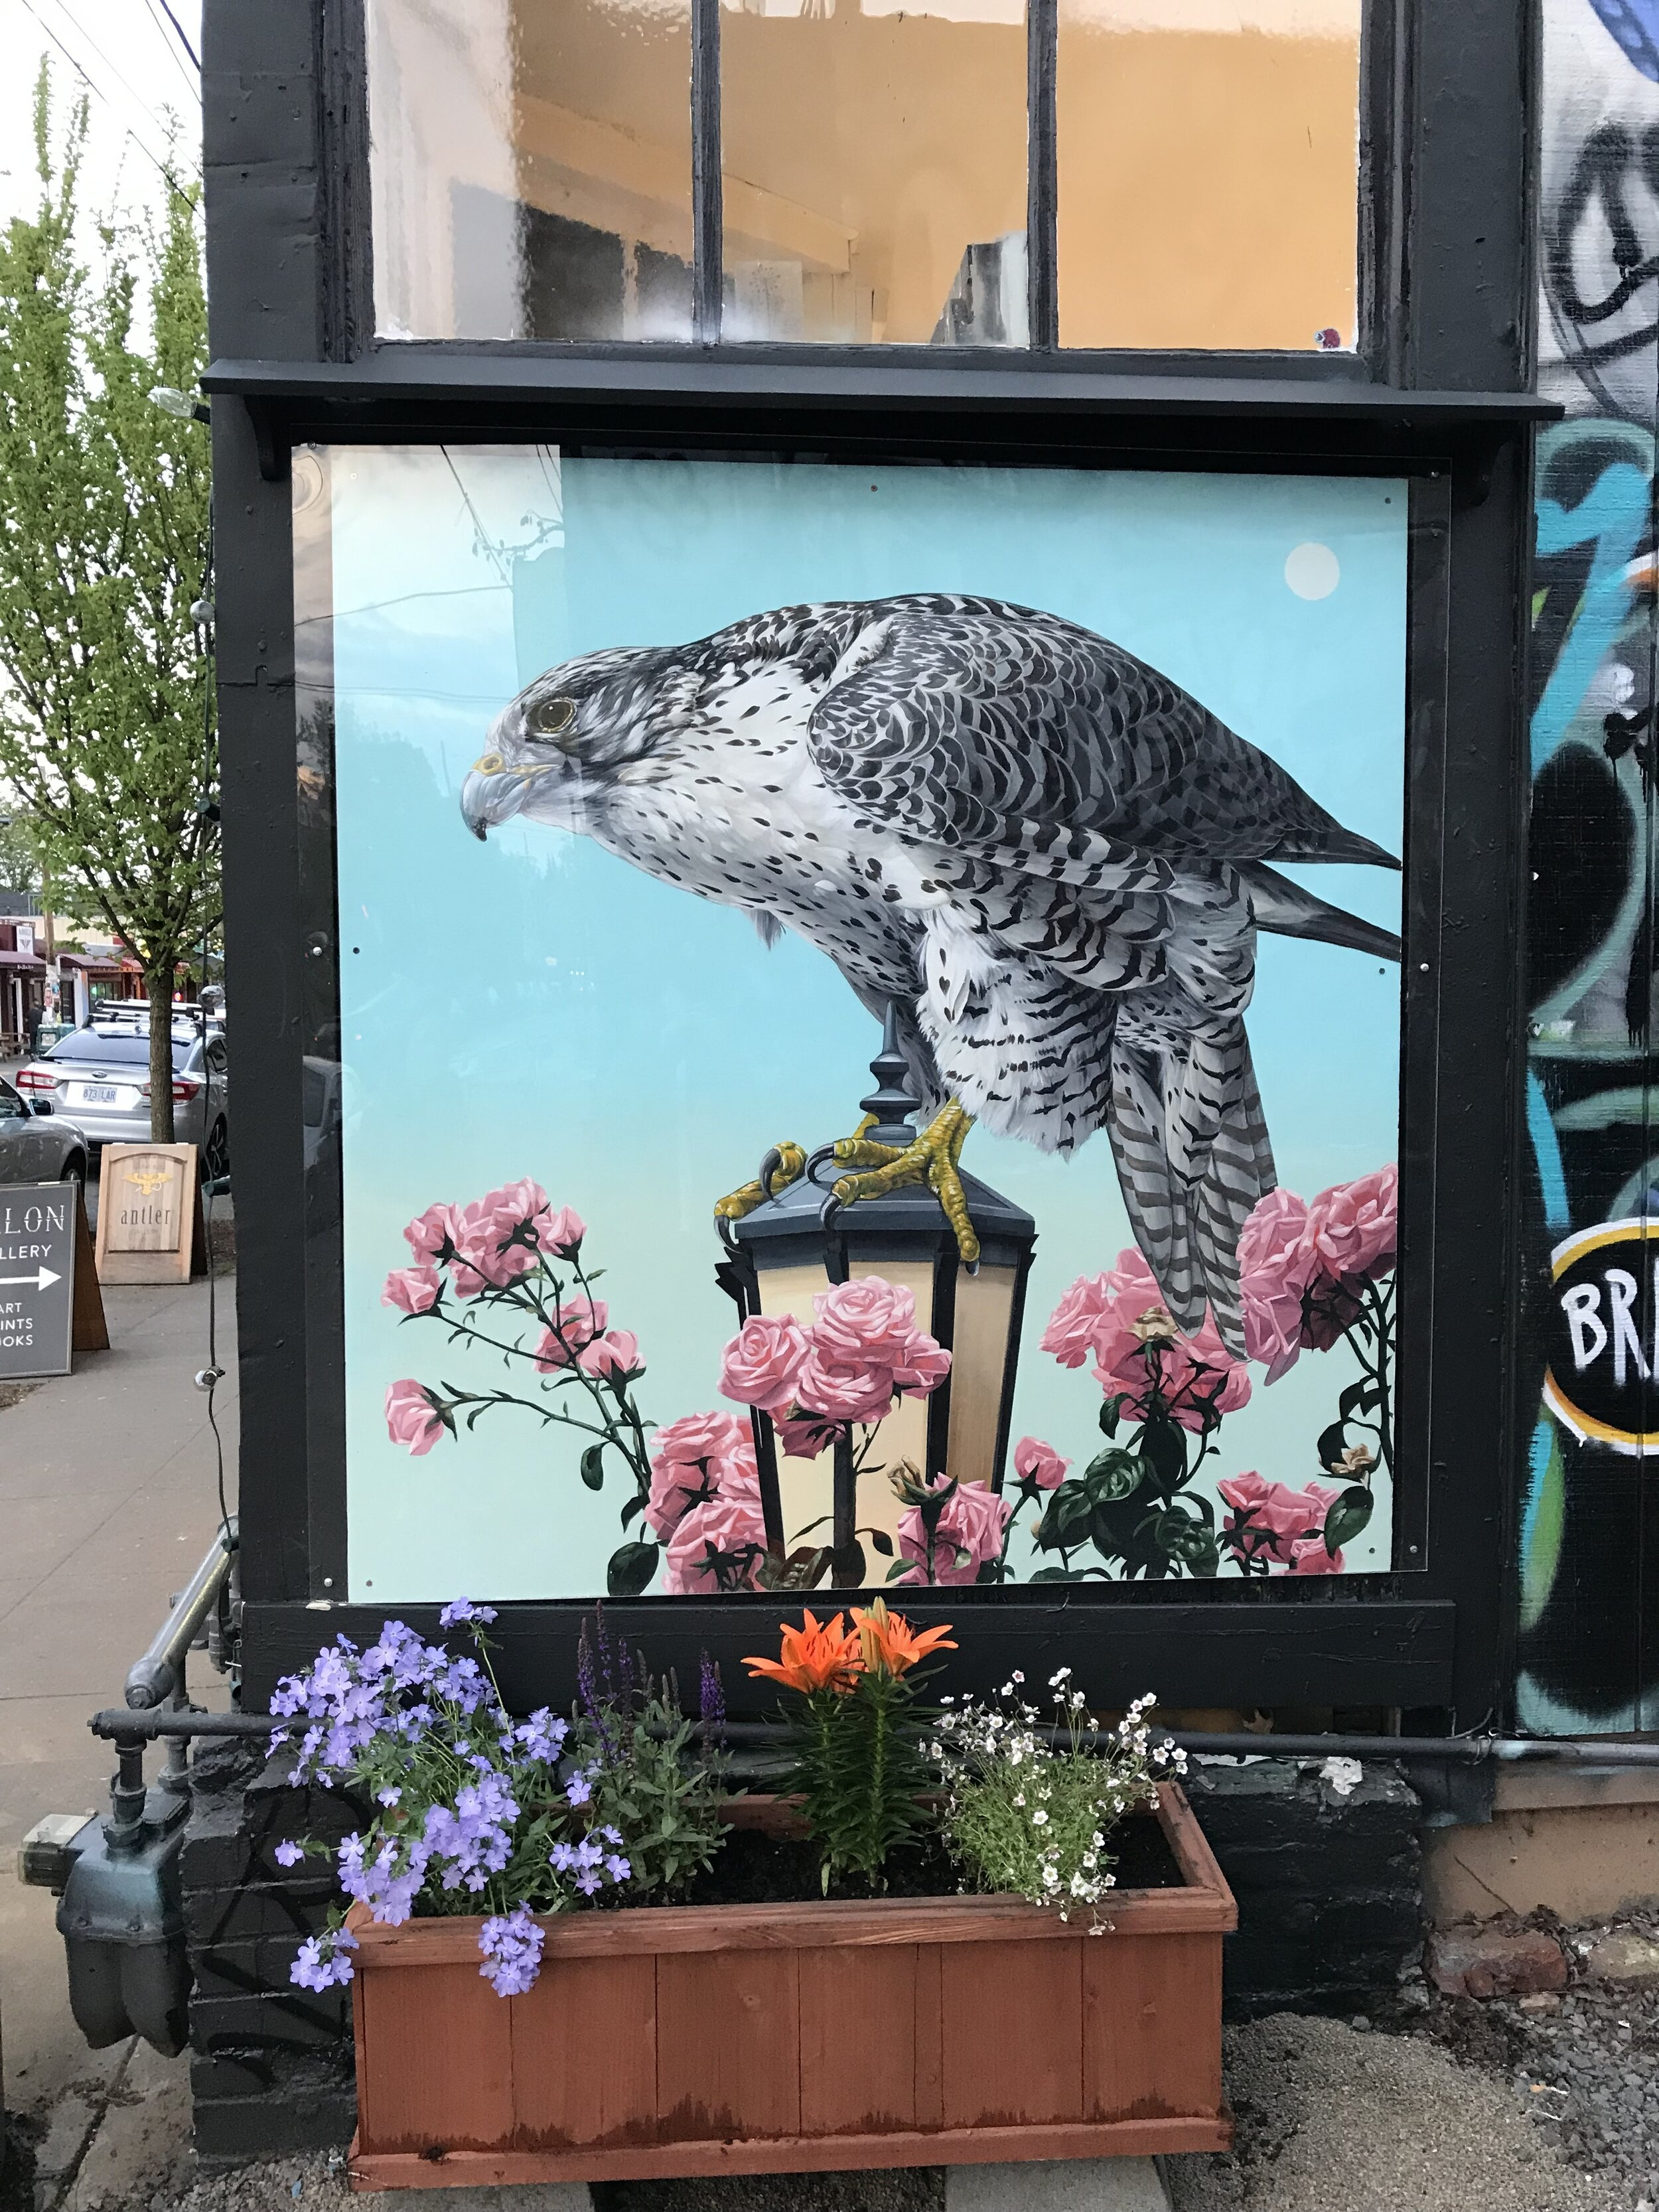 Mural for Talon Gallery, Portland, Oregon 2019